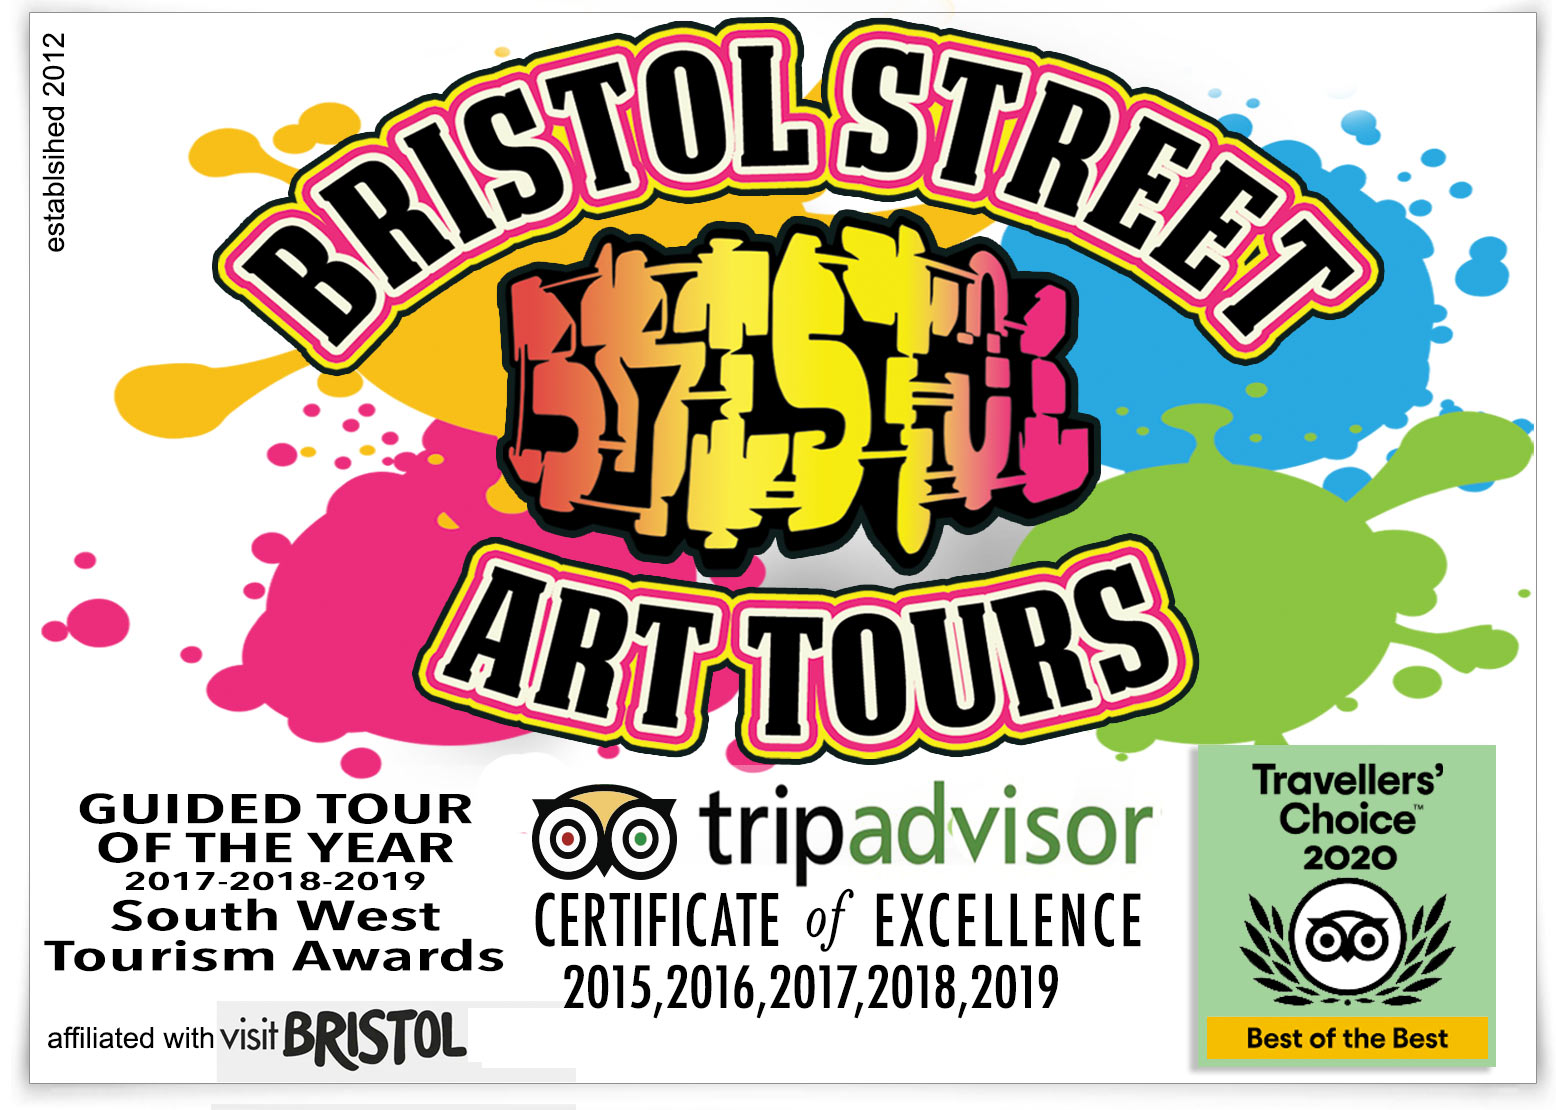 Bristol Street Art Tours